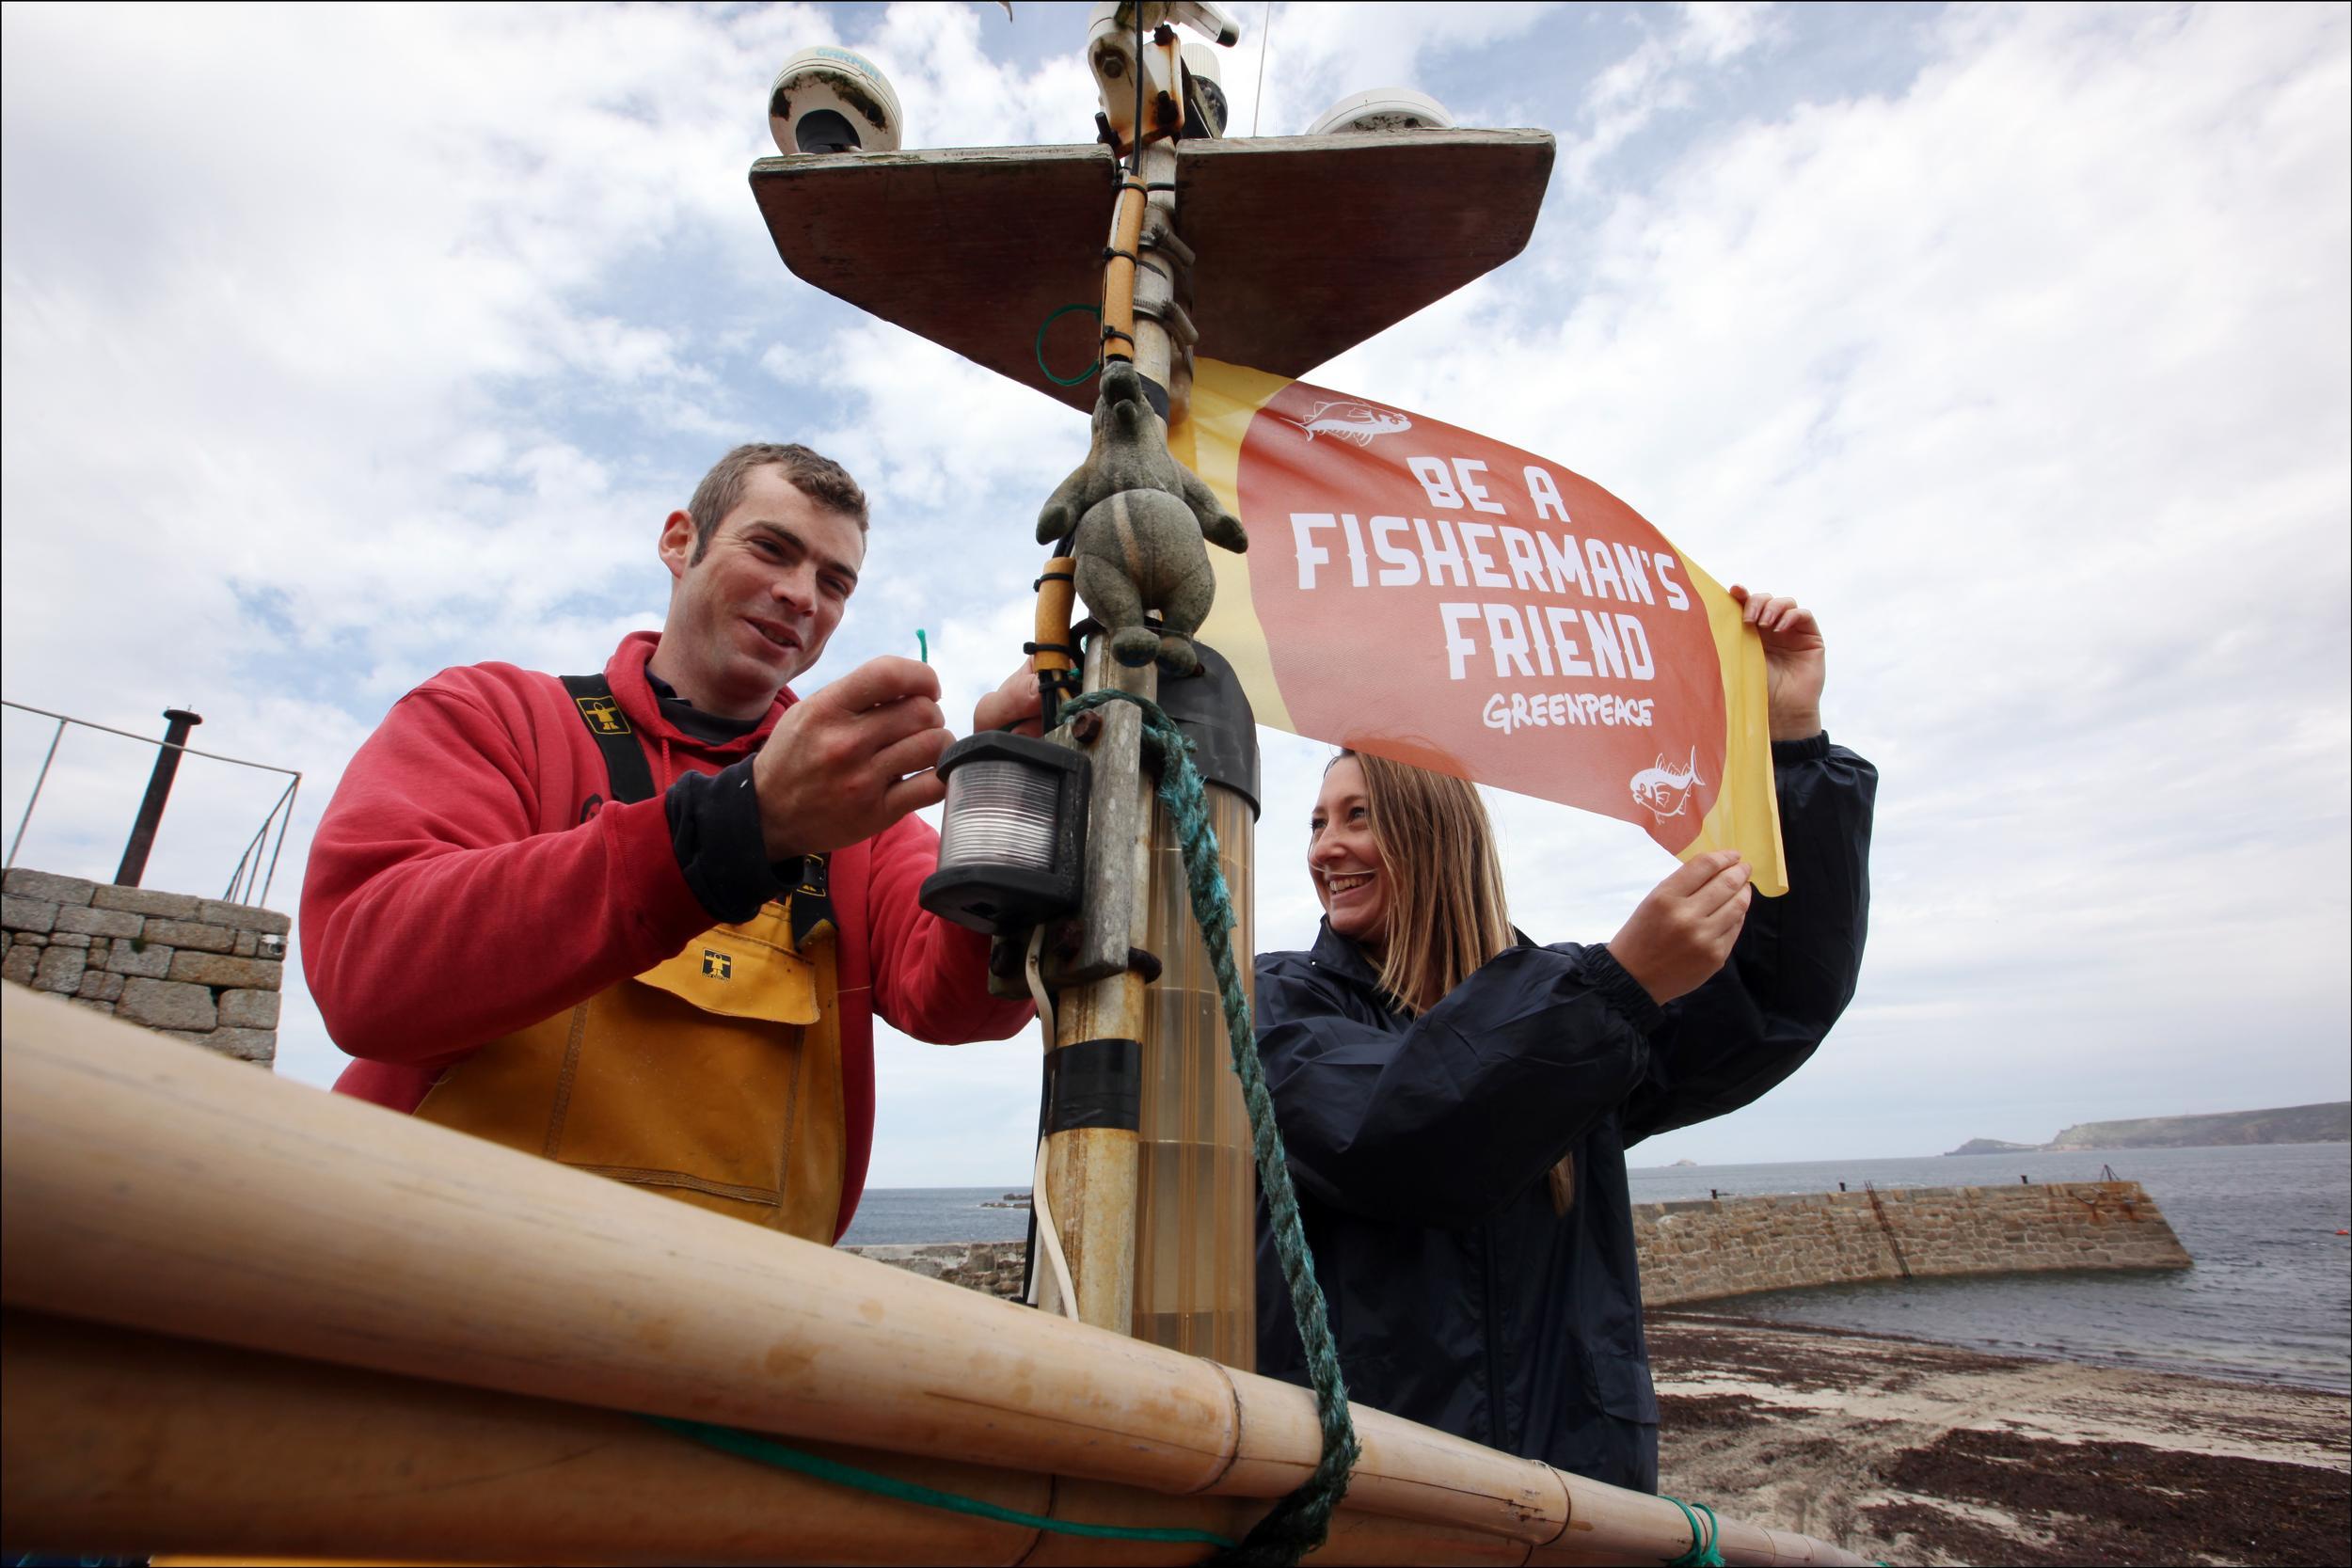 Greenpeace campaigners raise a flag reading